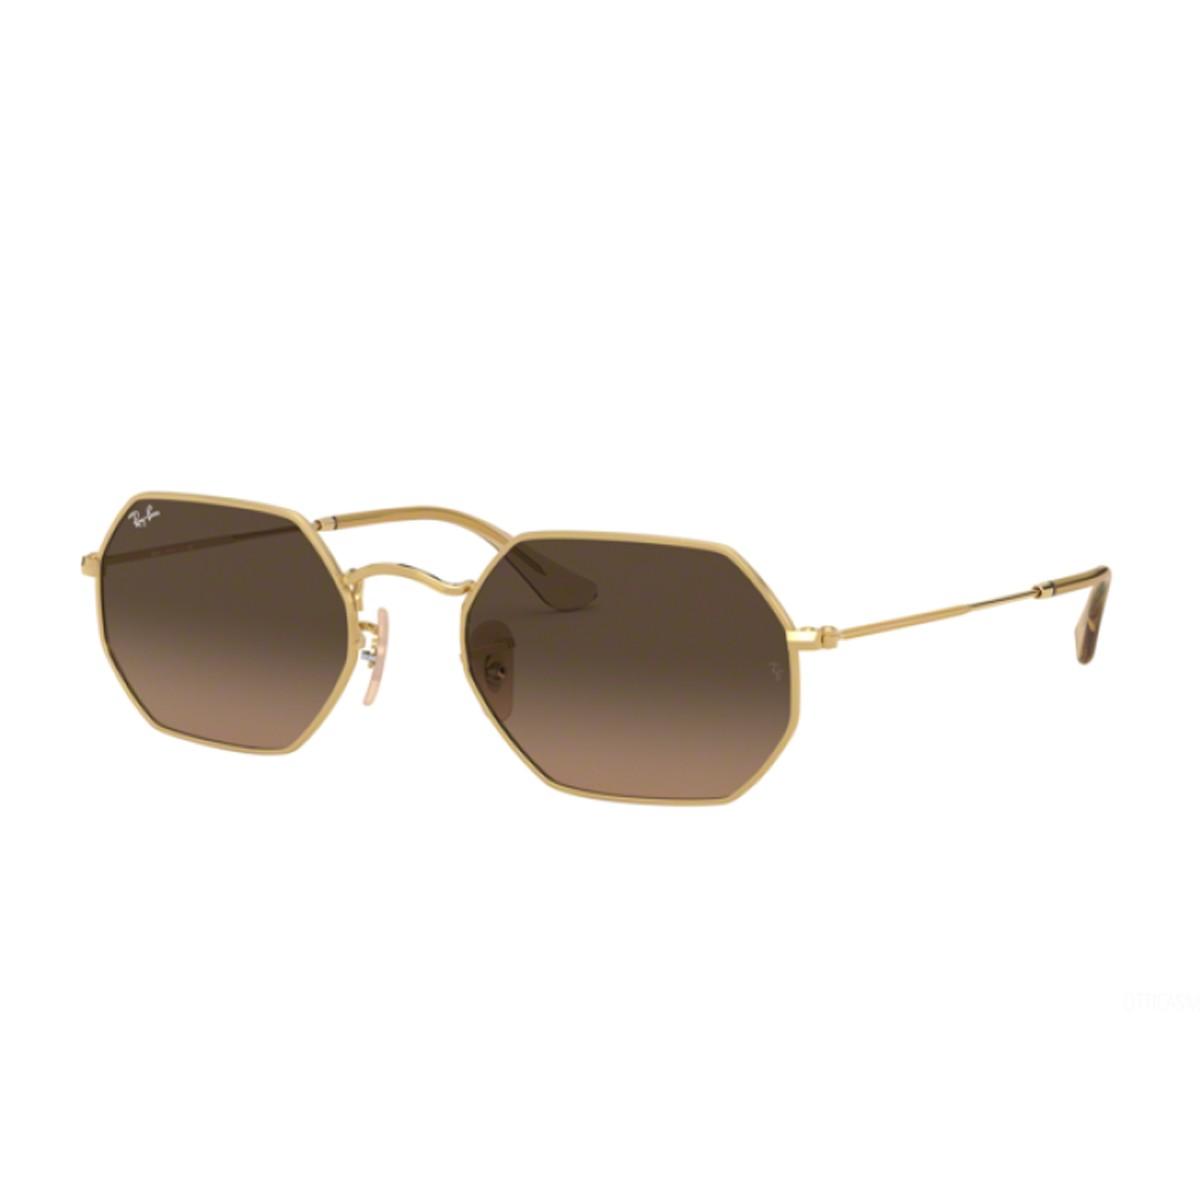 Ray-Ban Octagonal RB3556N   Unisex sunglasses